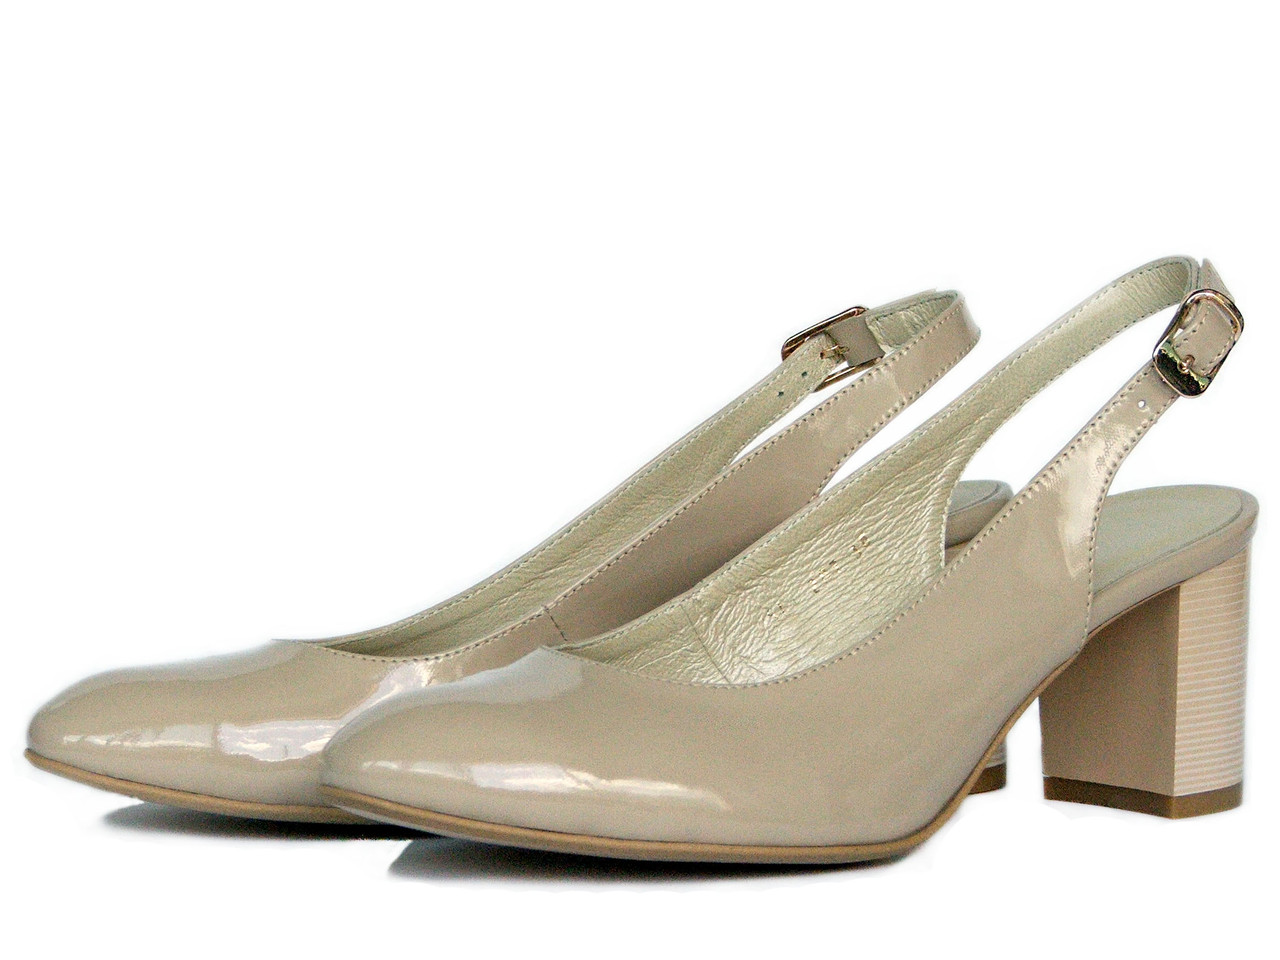 Бежевые лаковые босоножки на каблуке